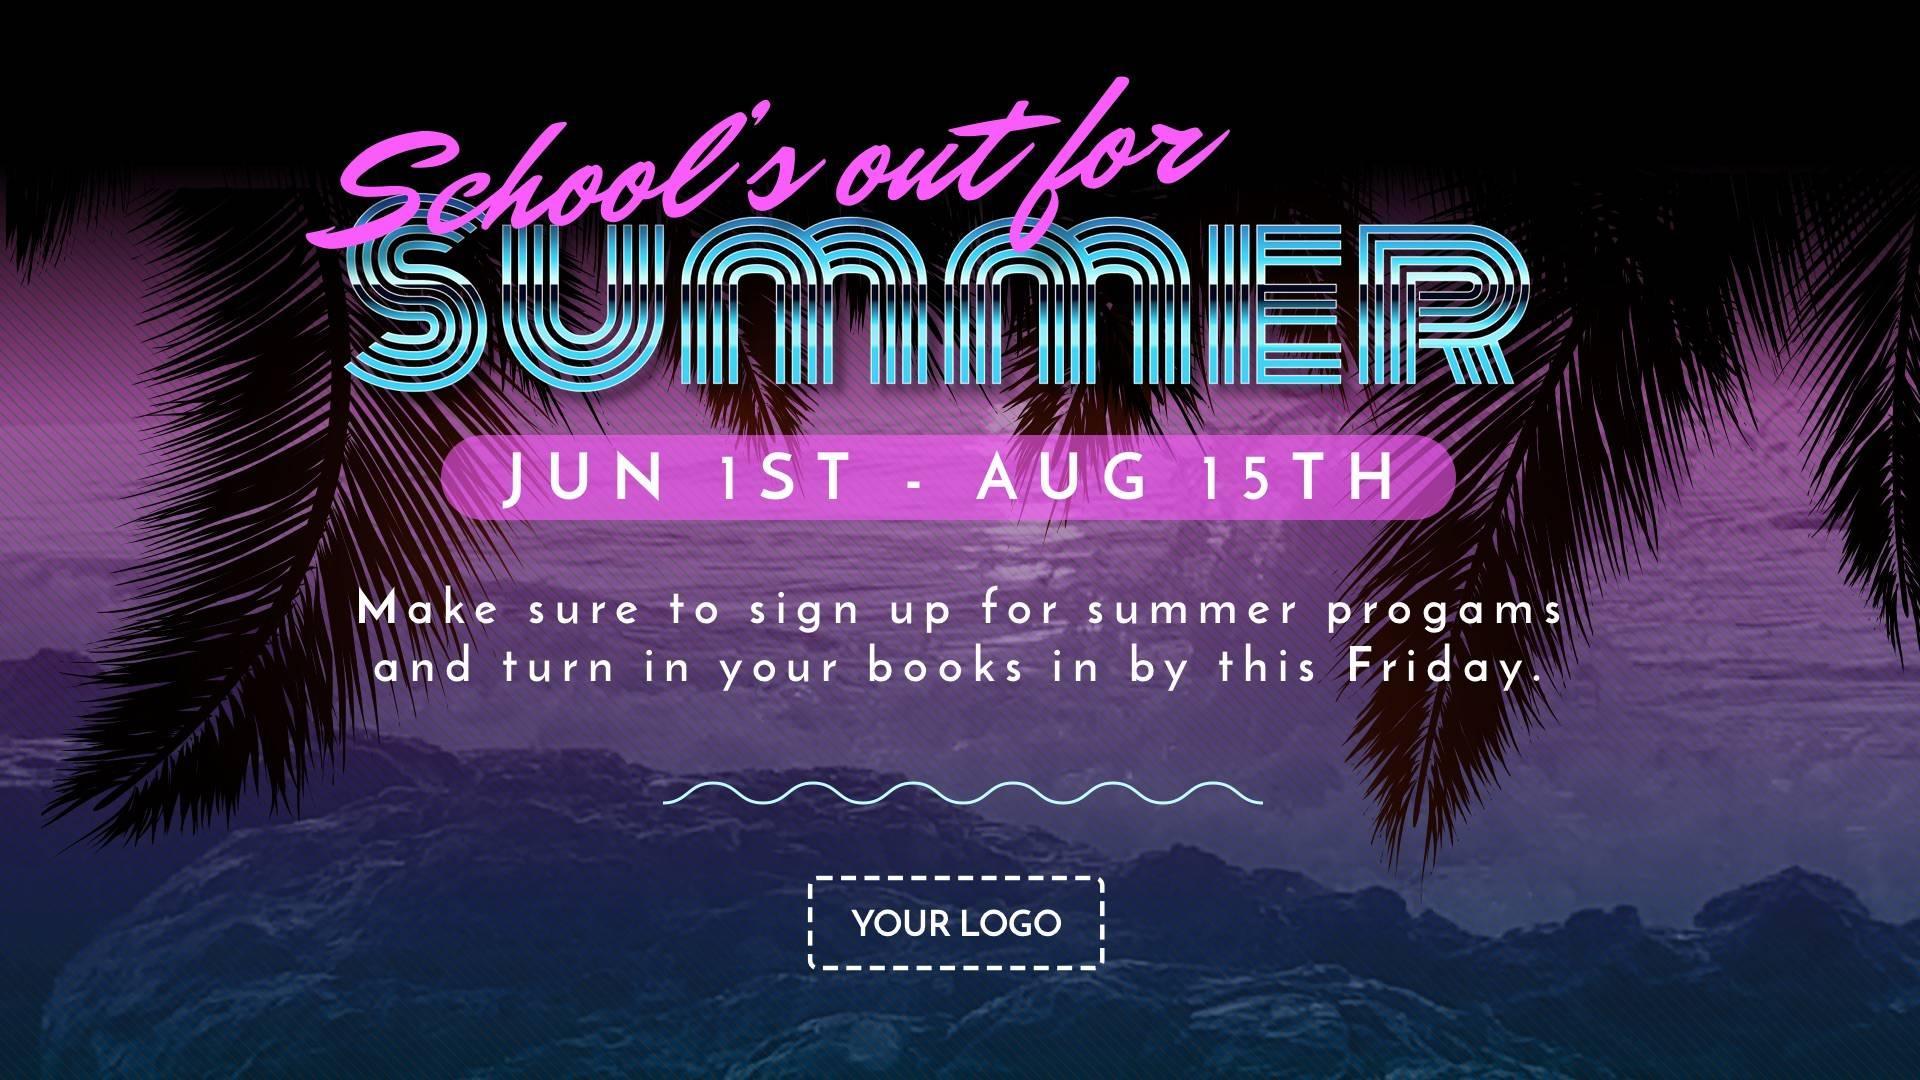 Summer Break Digital Signage Template